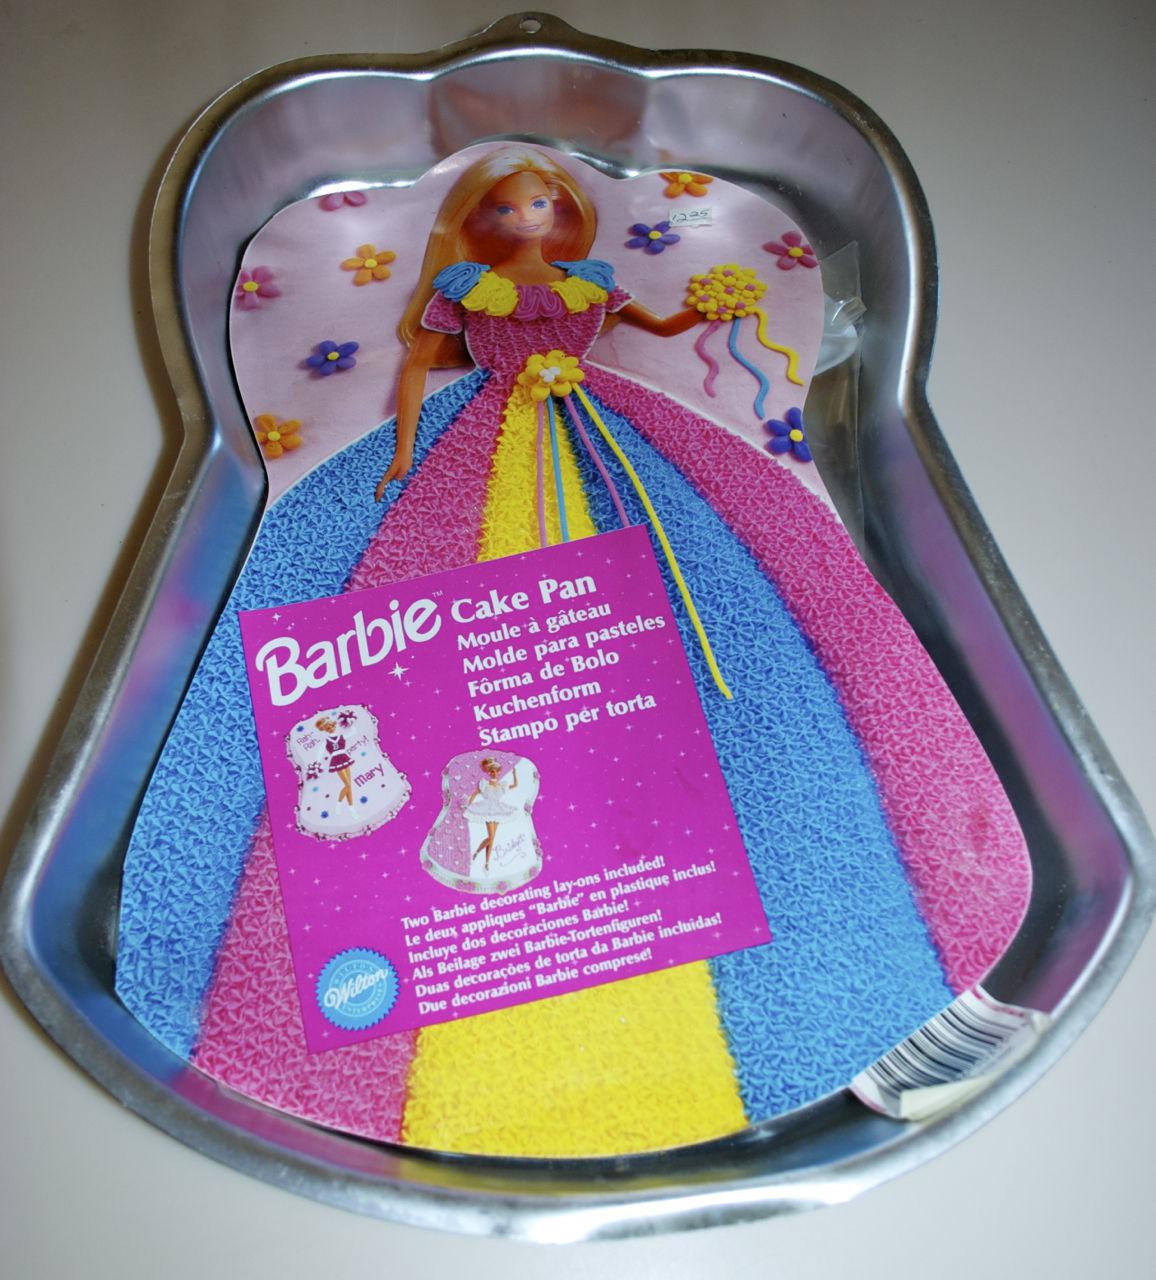 Barbie Cake Pan Instructions